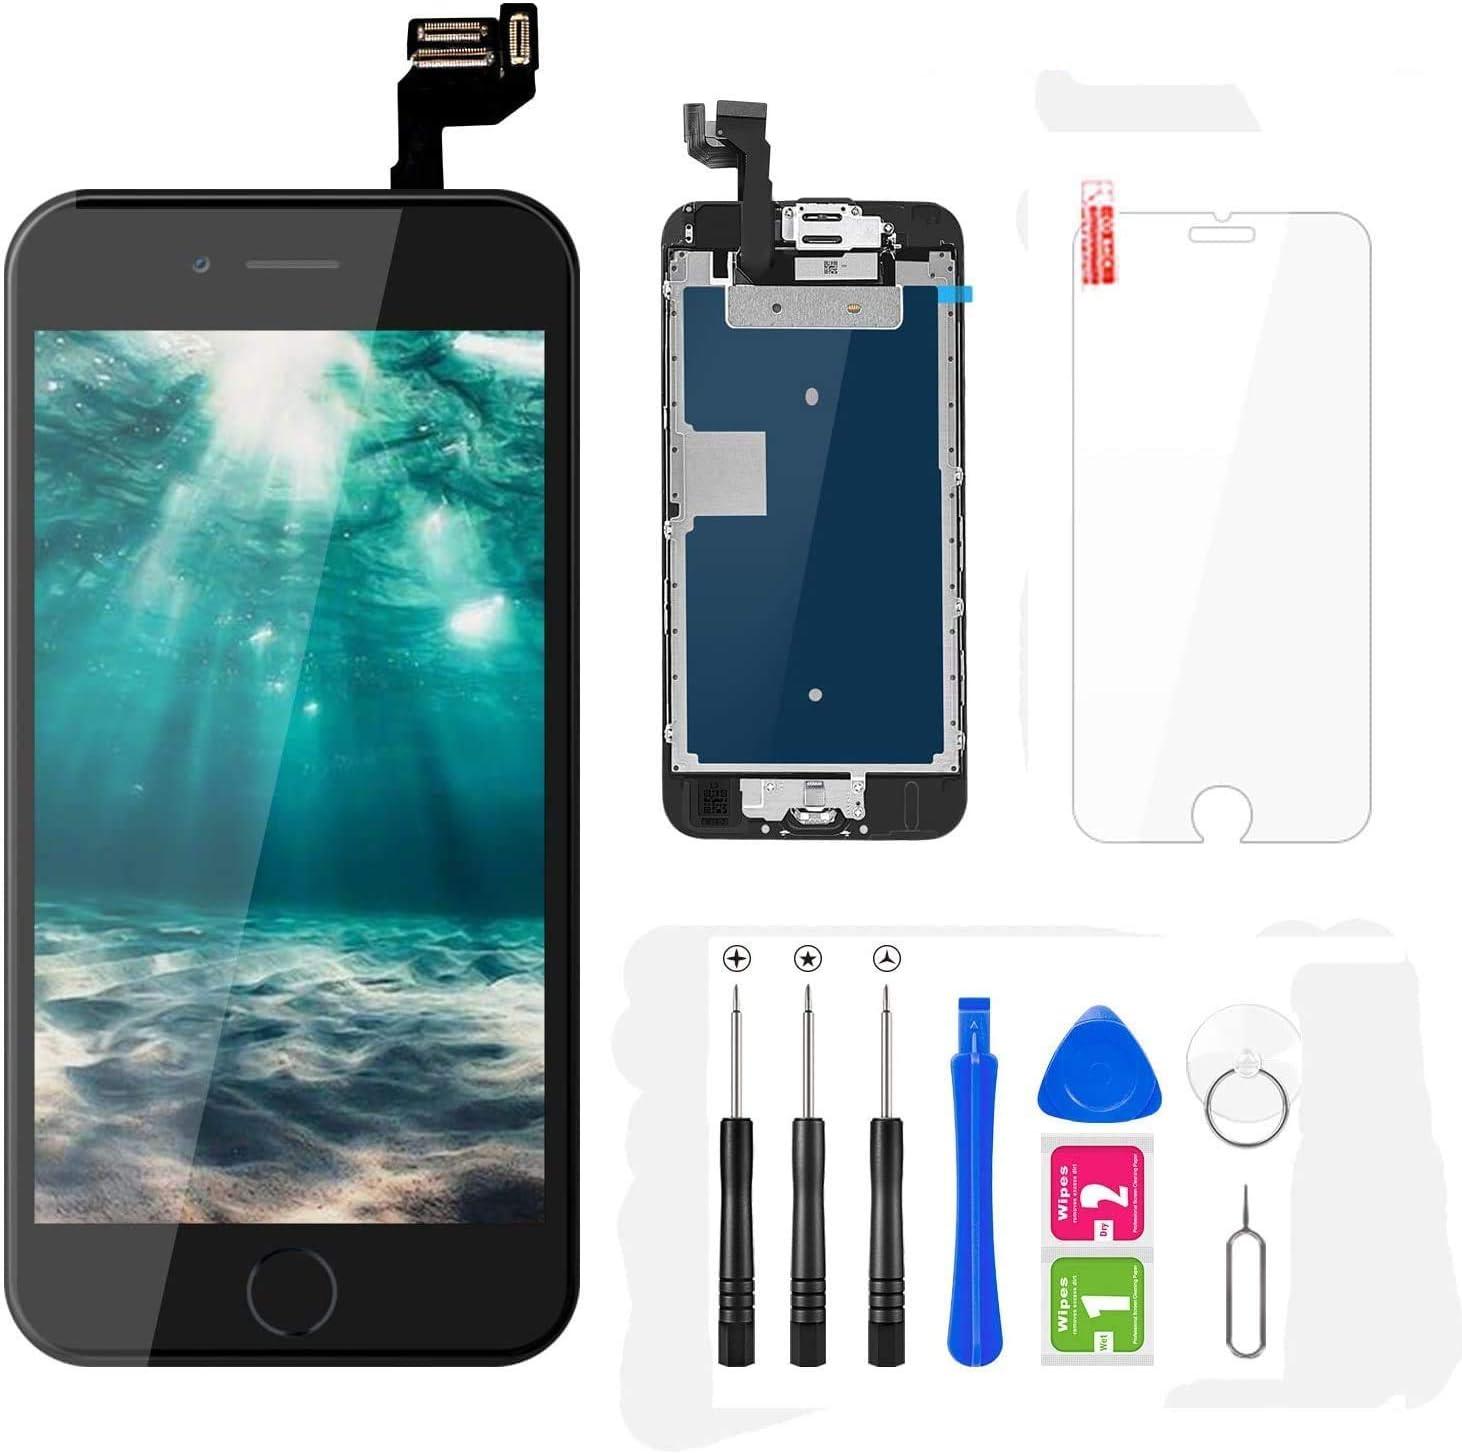 FLYLINKTECH Pantalla para iPhone 6s 4.7 ,Táctil LCD de Repuesto Ensamblaje de Marco Digitalizador con botón de Inicio,cámara Frontal,Sensor de ...